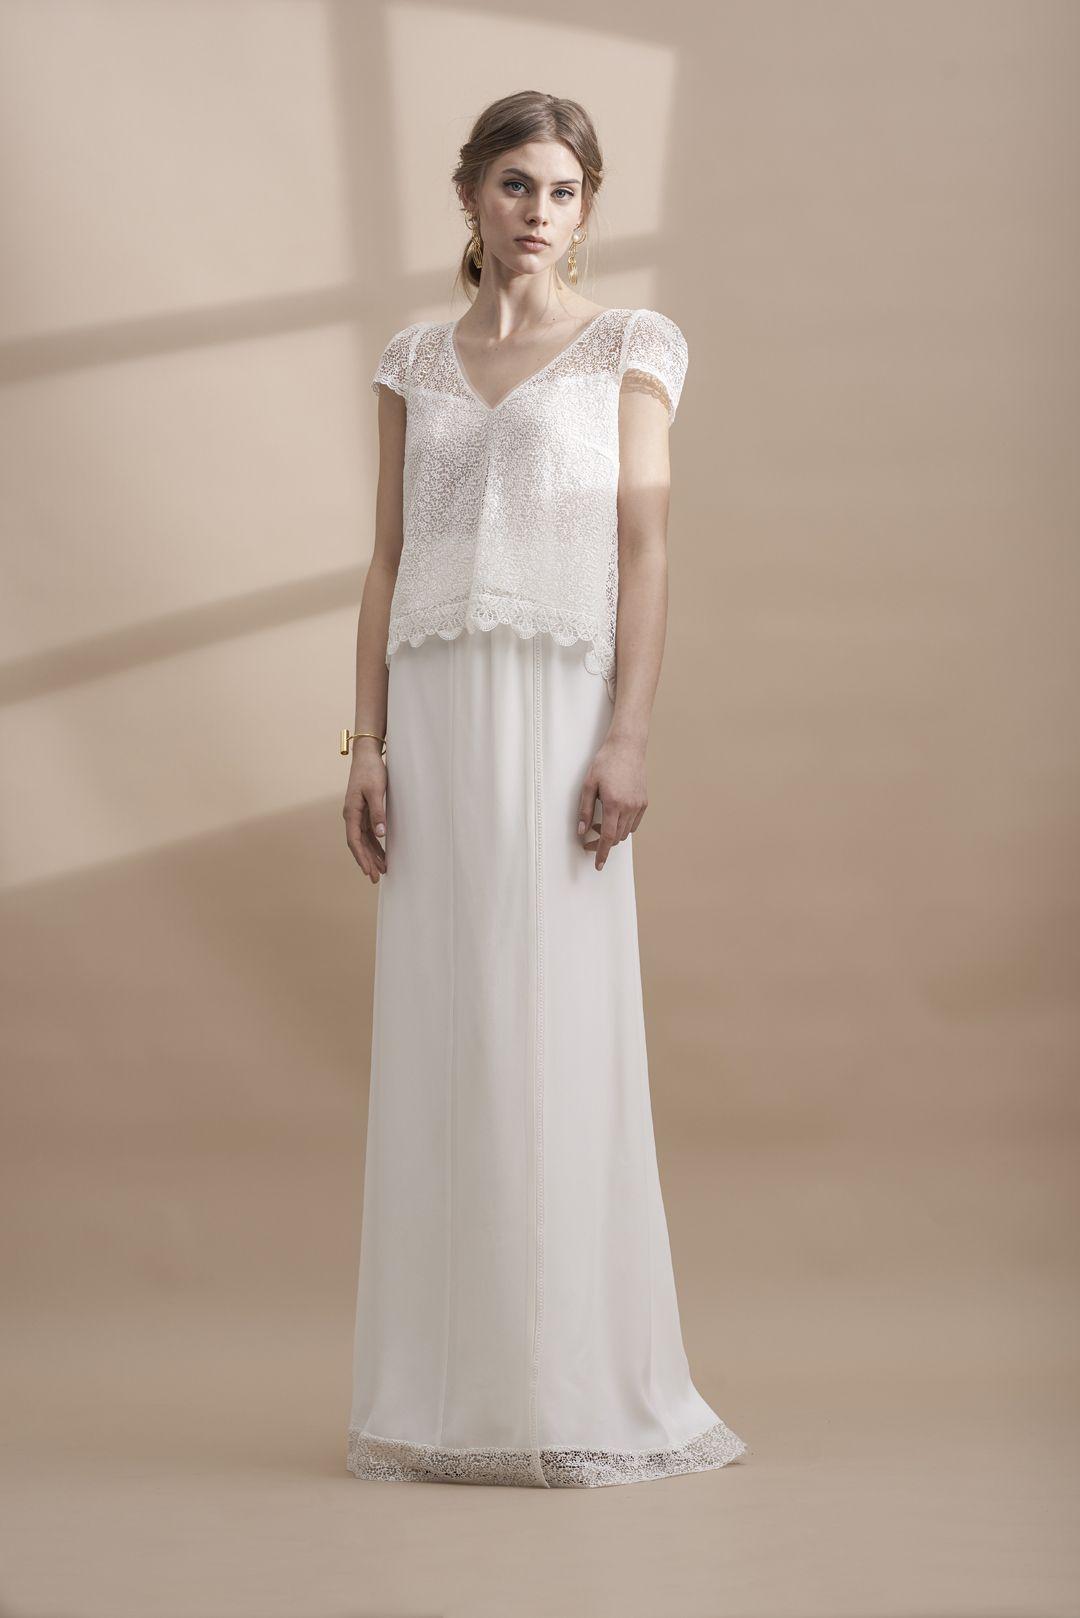 Rembo Styling 16  Rembo styling, Brautmode, Kleid hochzeit